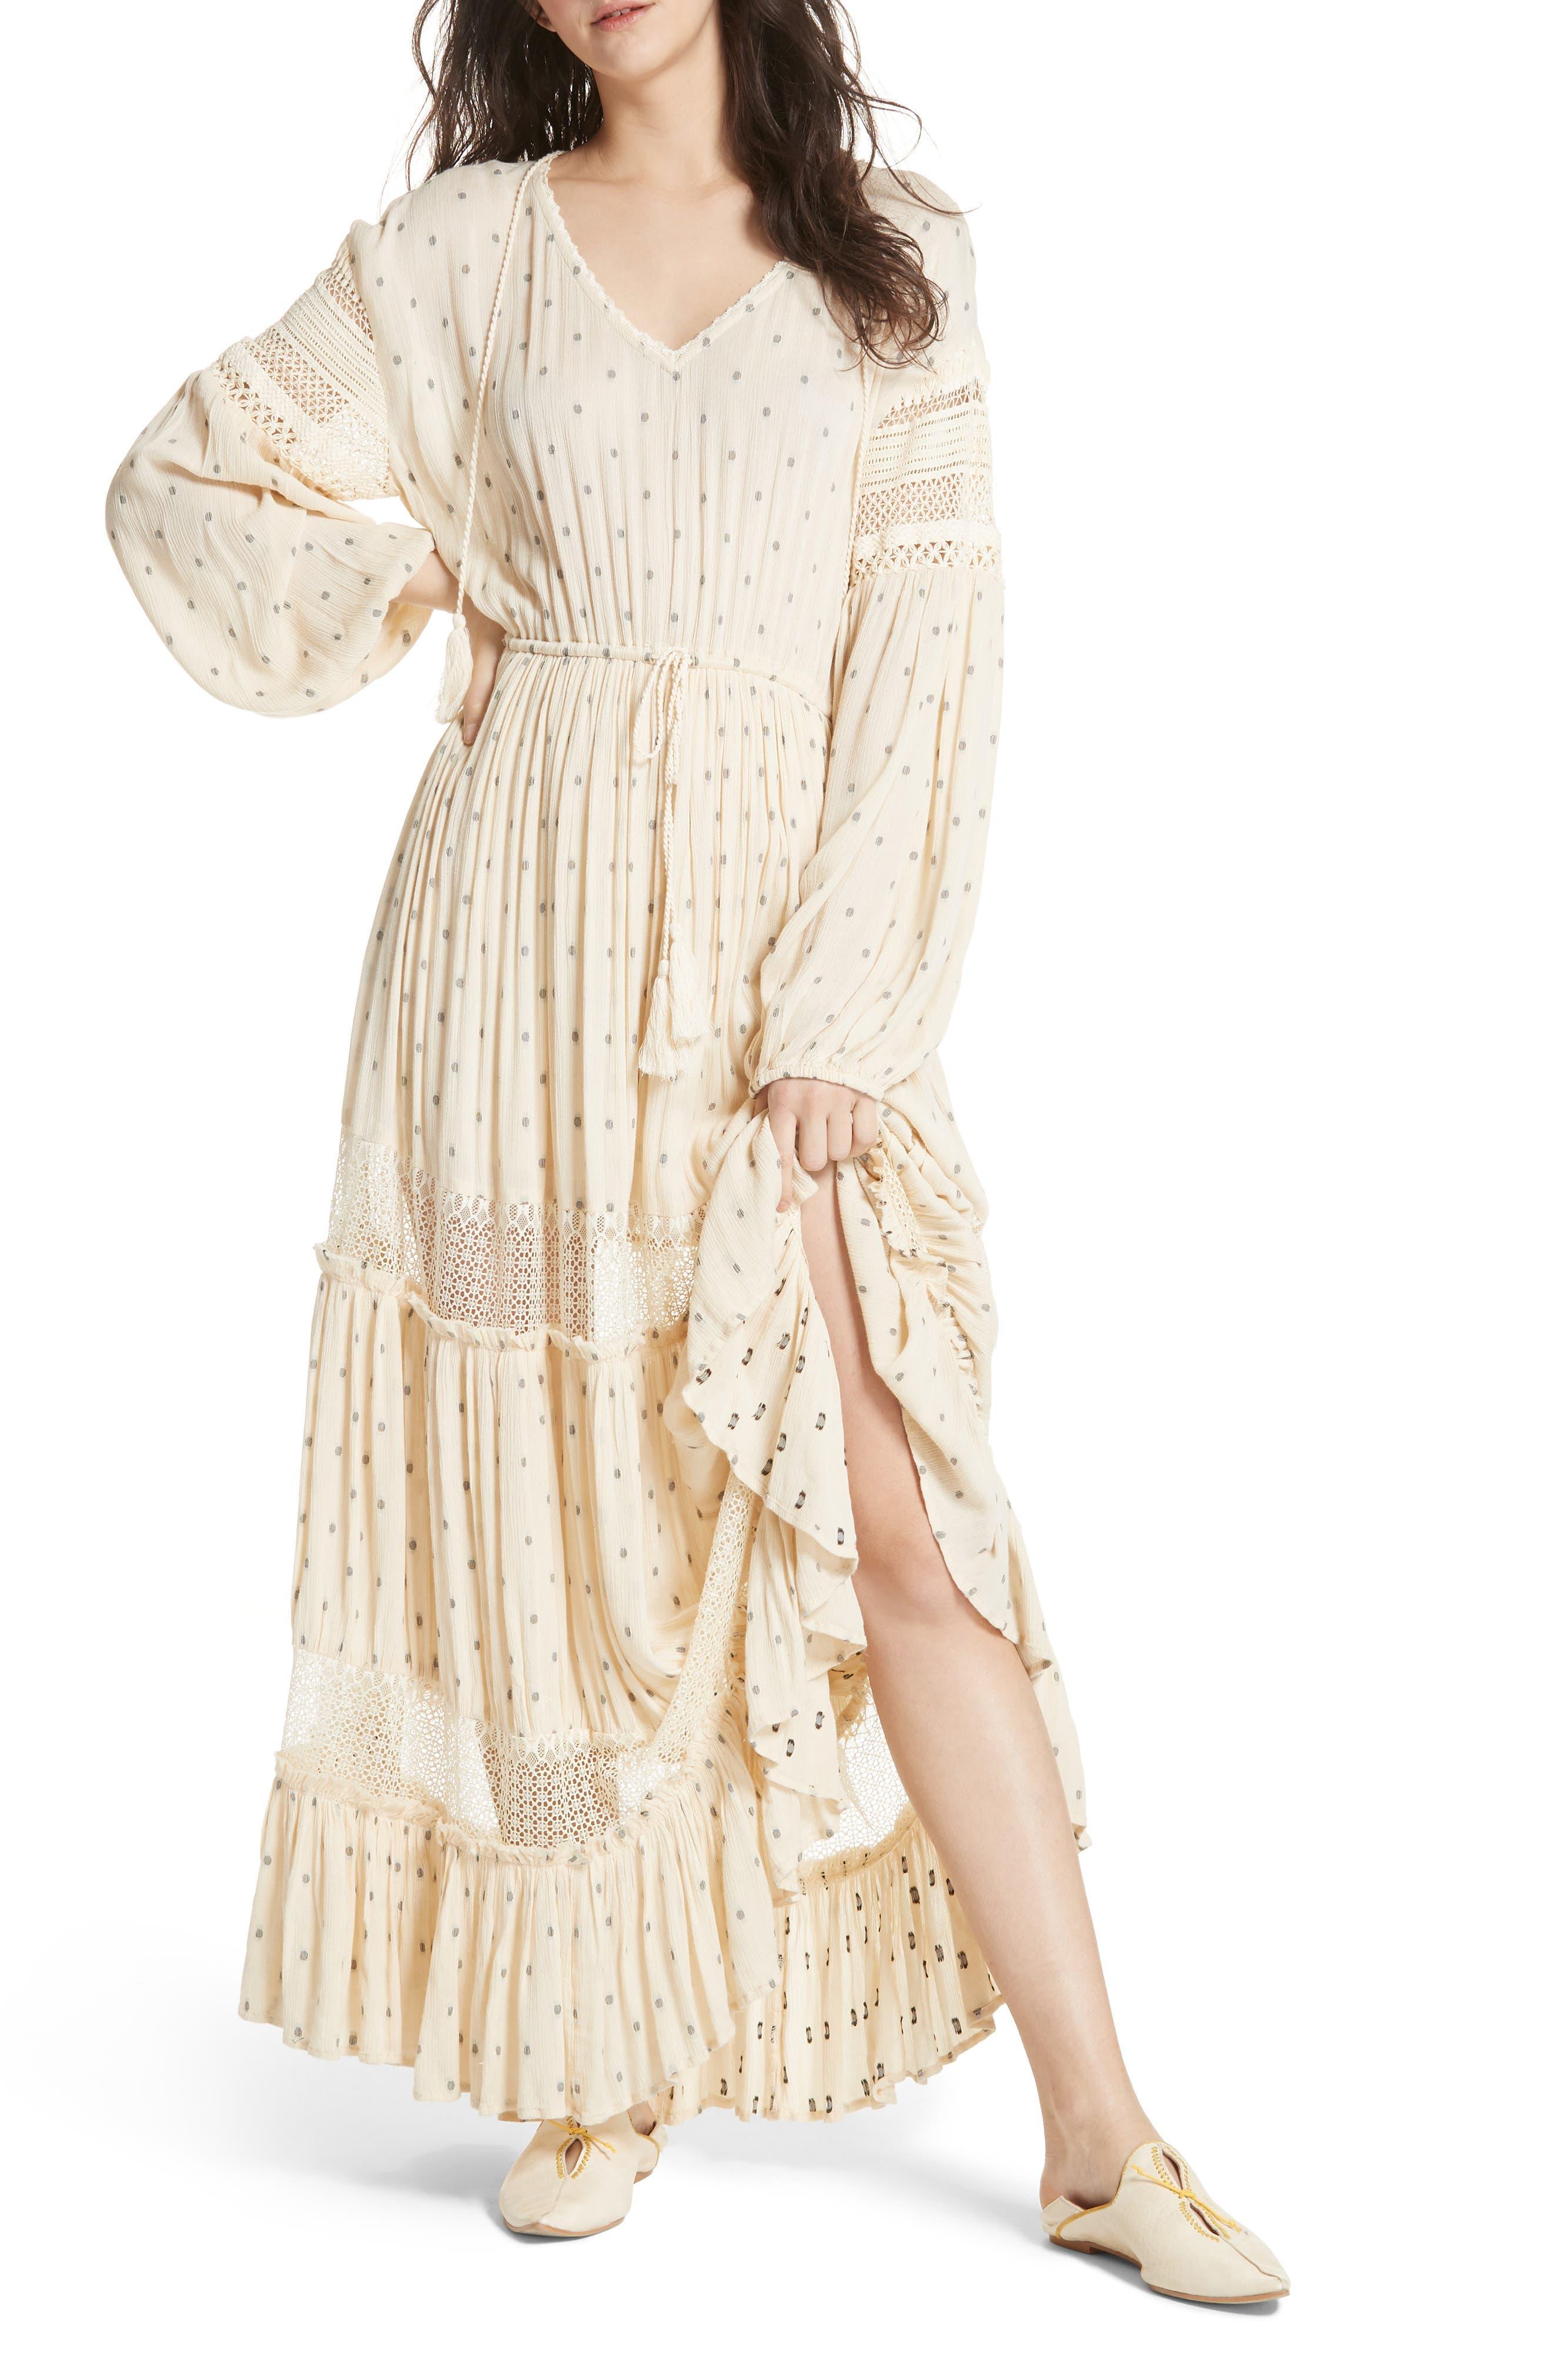 Sada Maxi Dress,                             Main thumbnail 1, color,                             903